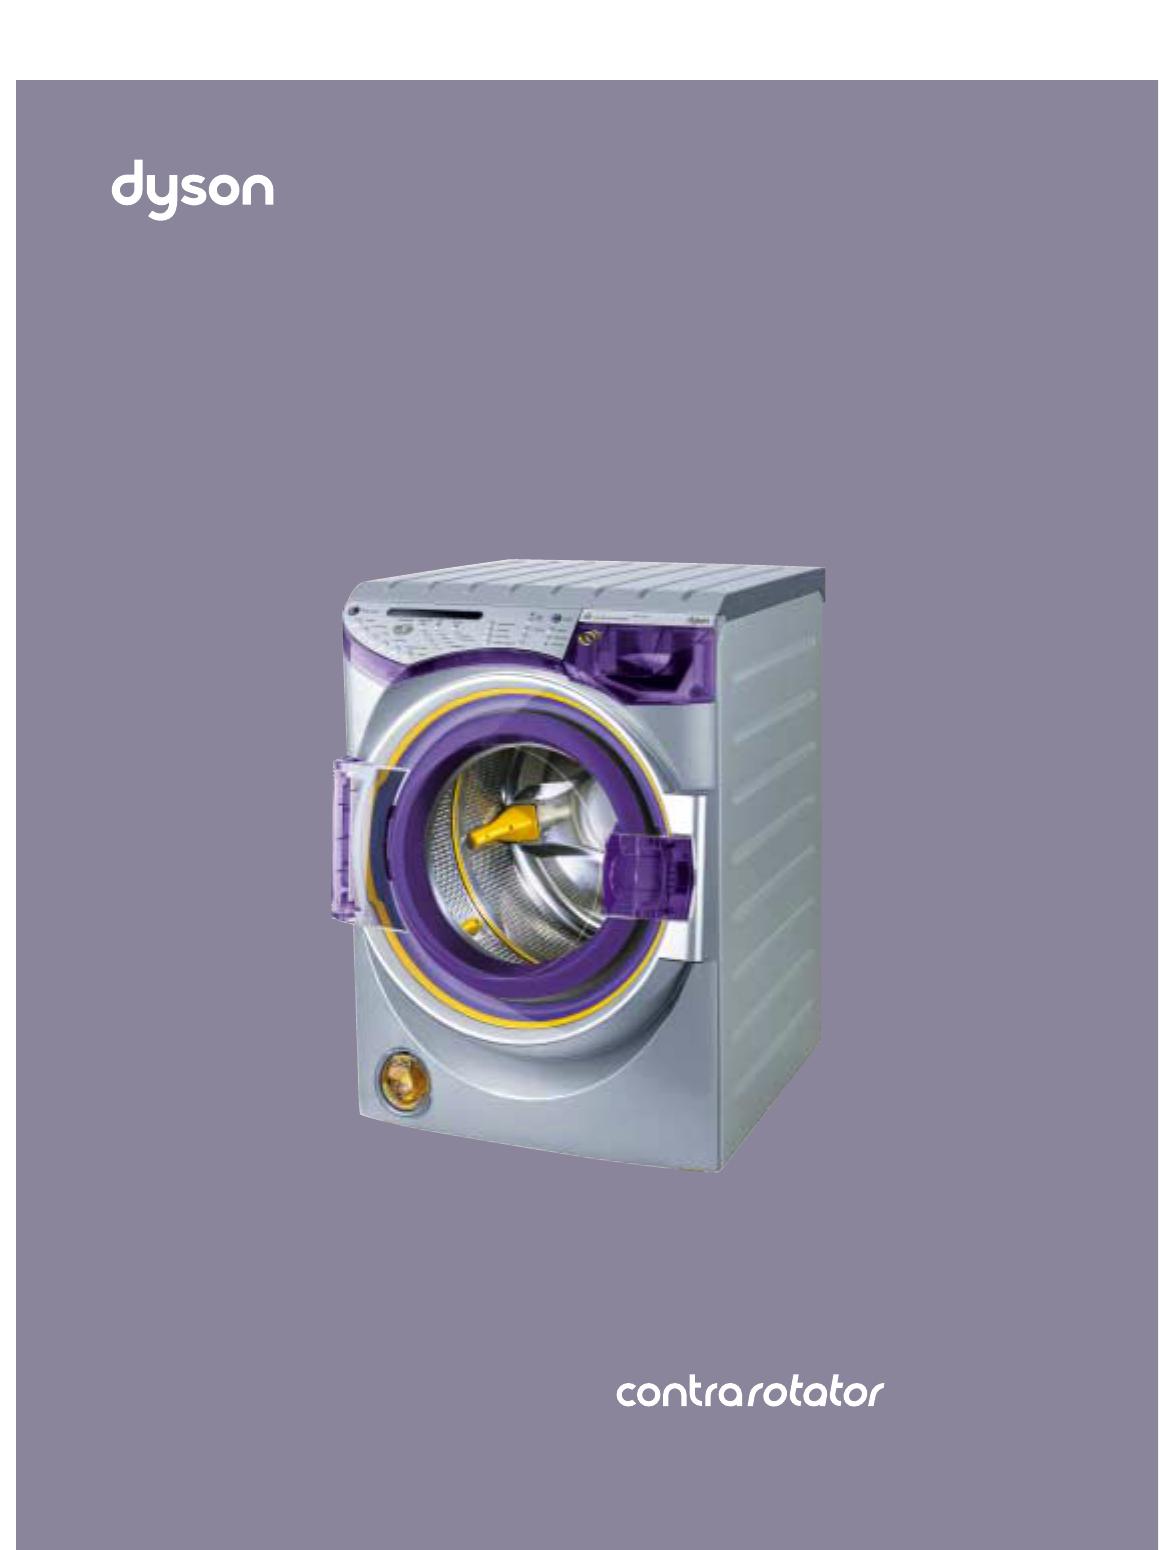 febcc26 dyson washing machine wiring diagram | wiring library  wiring library